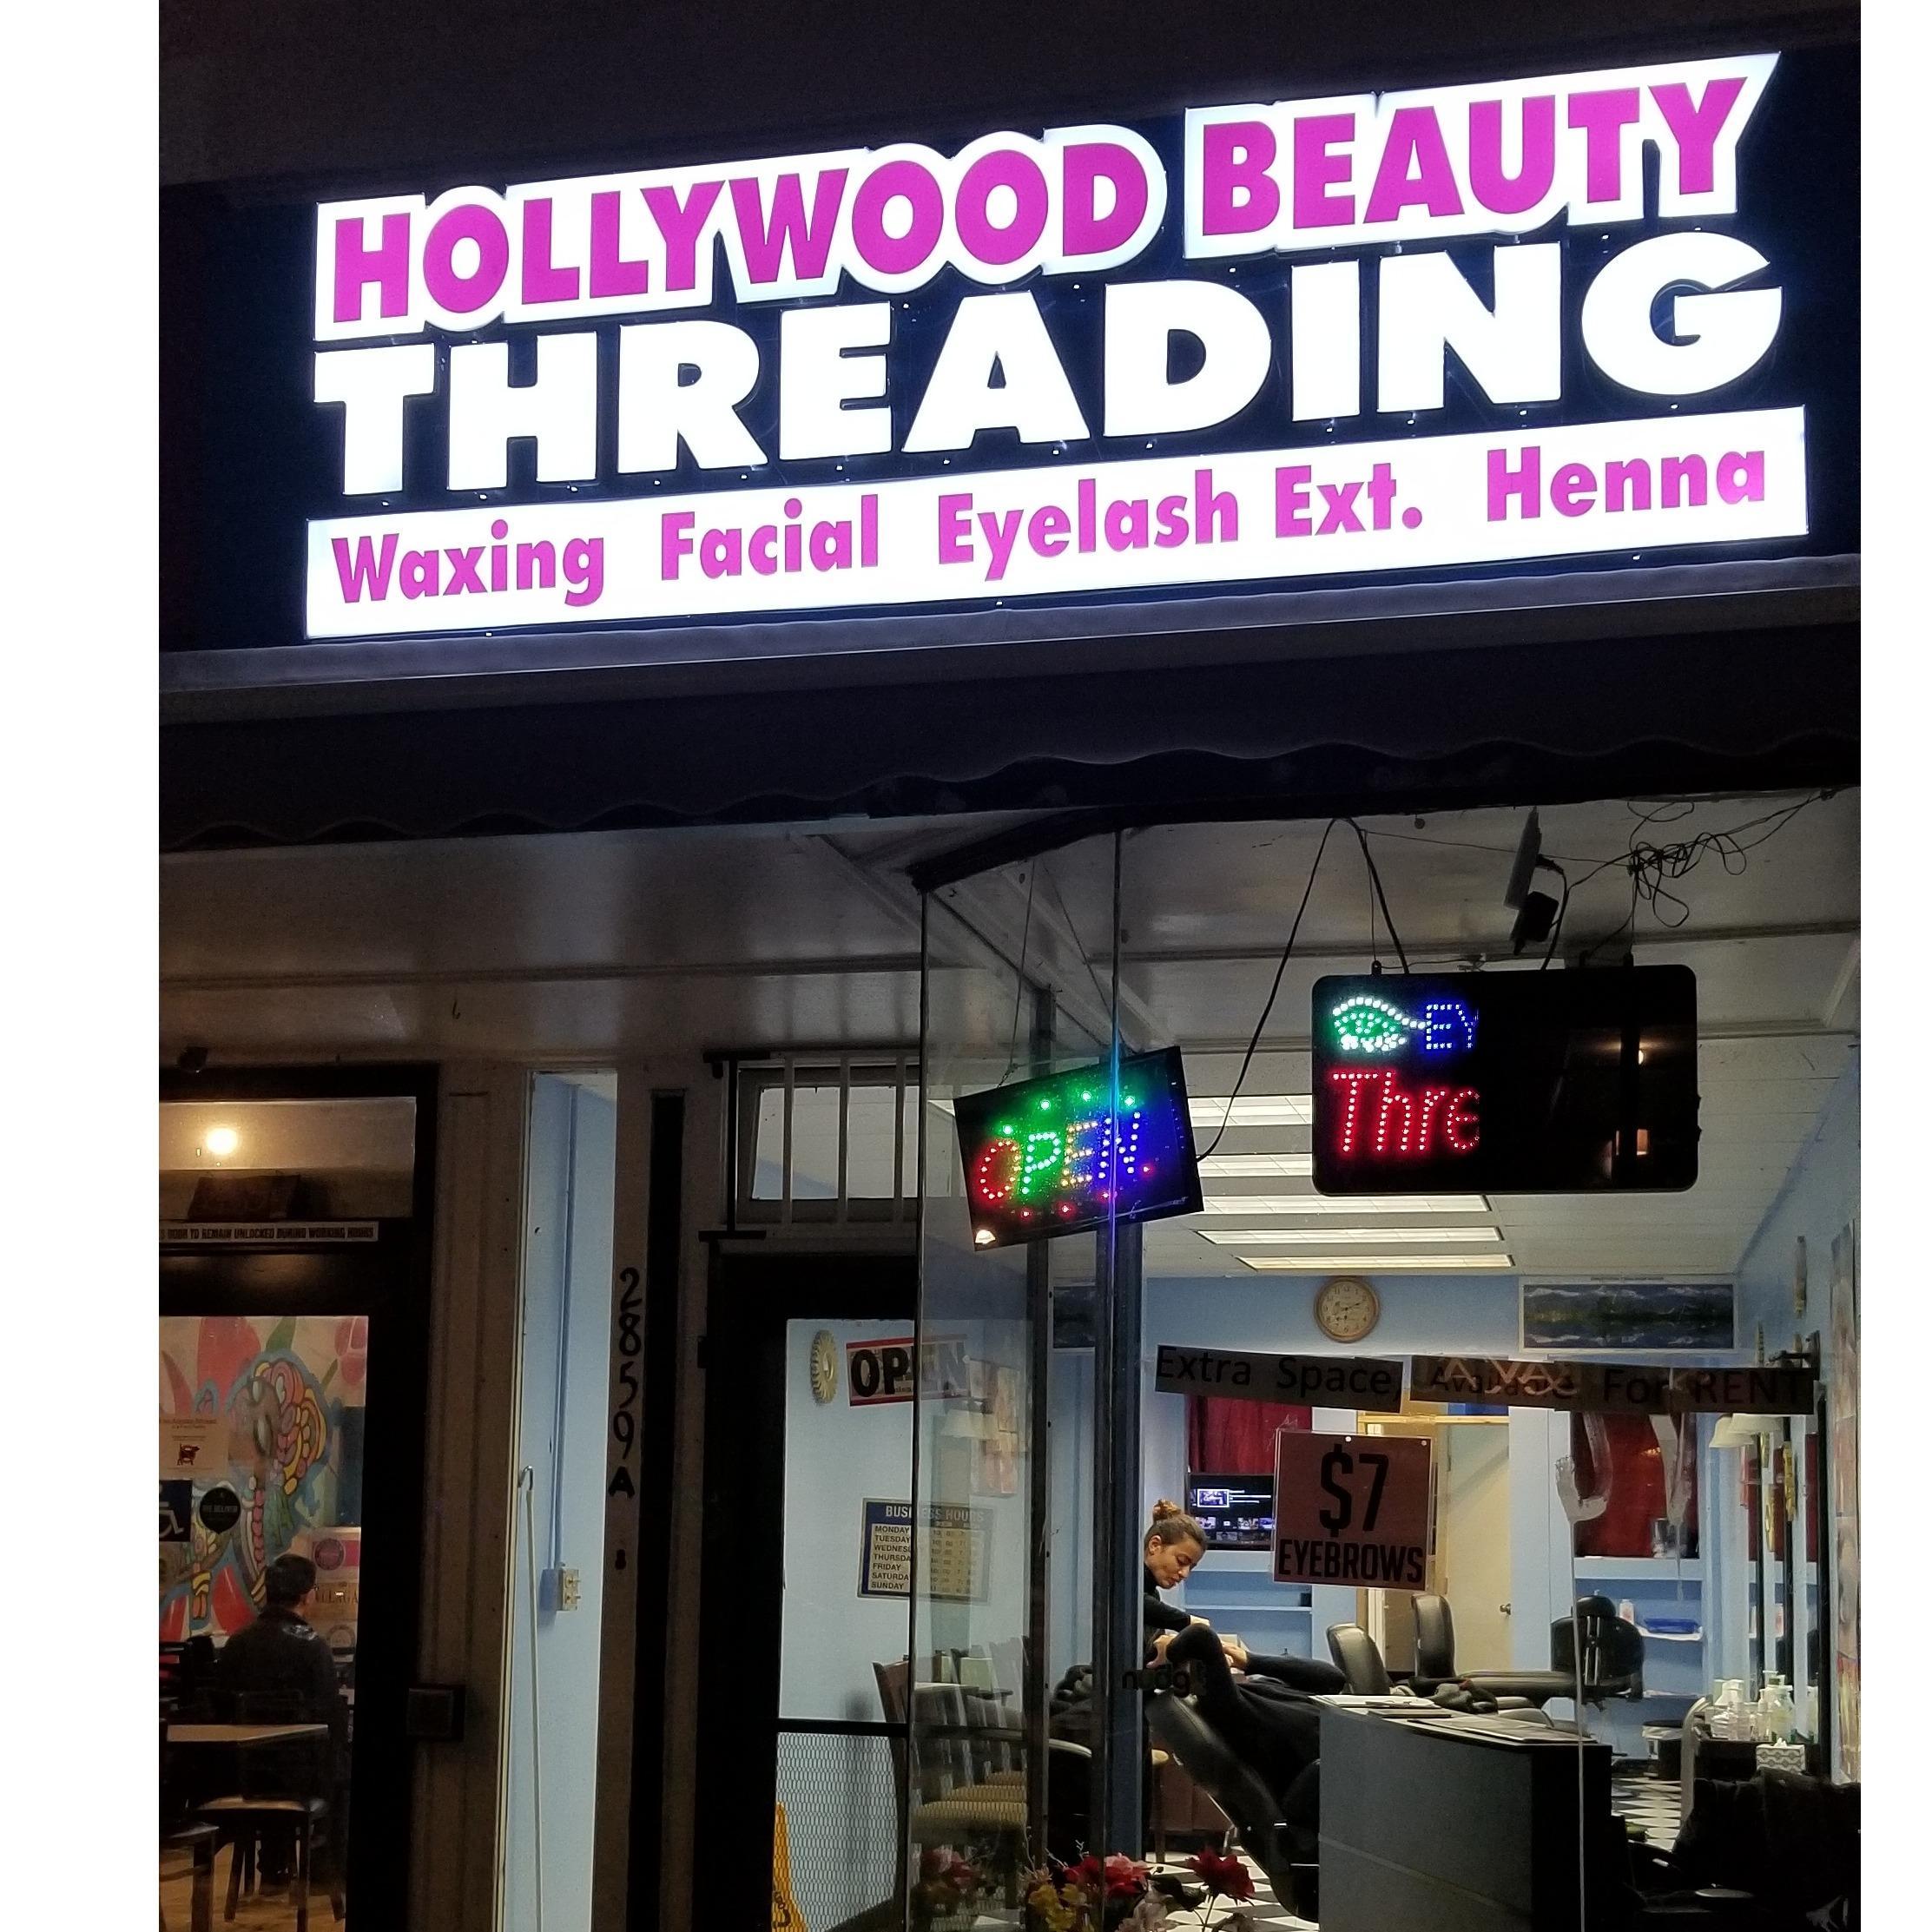 Hollywood Beauty Threading